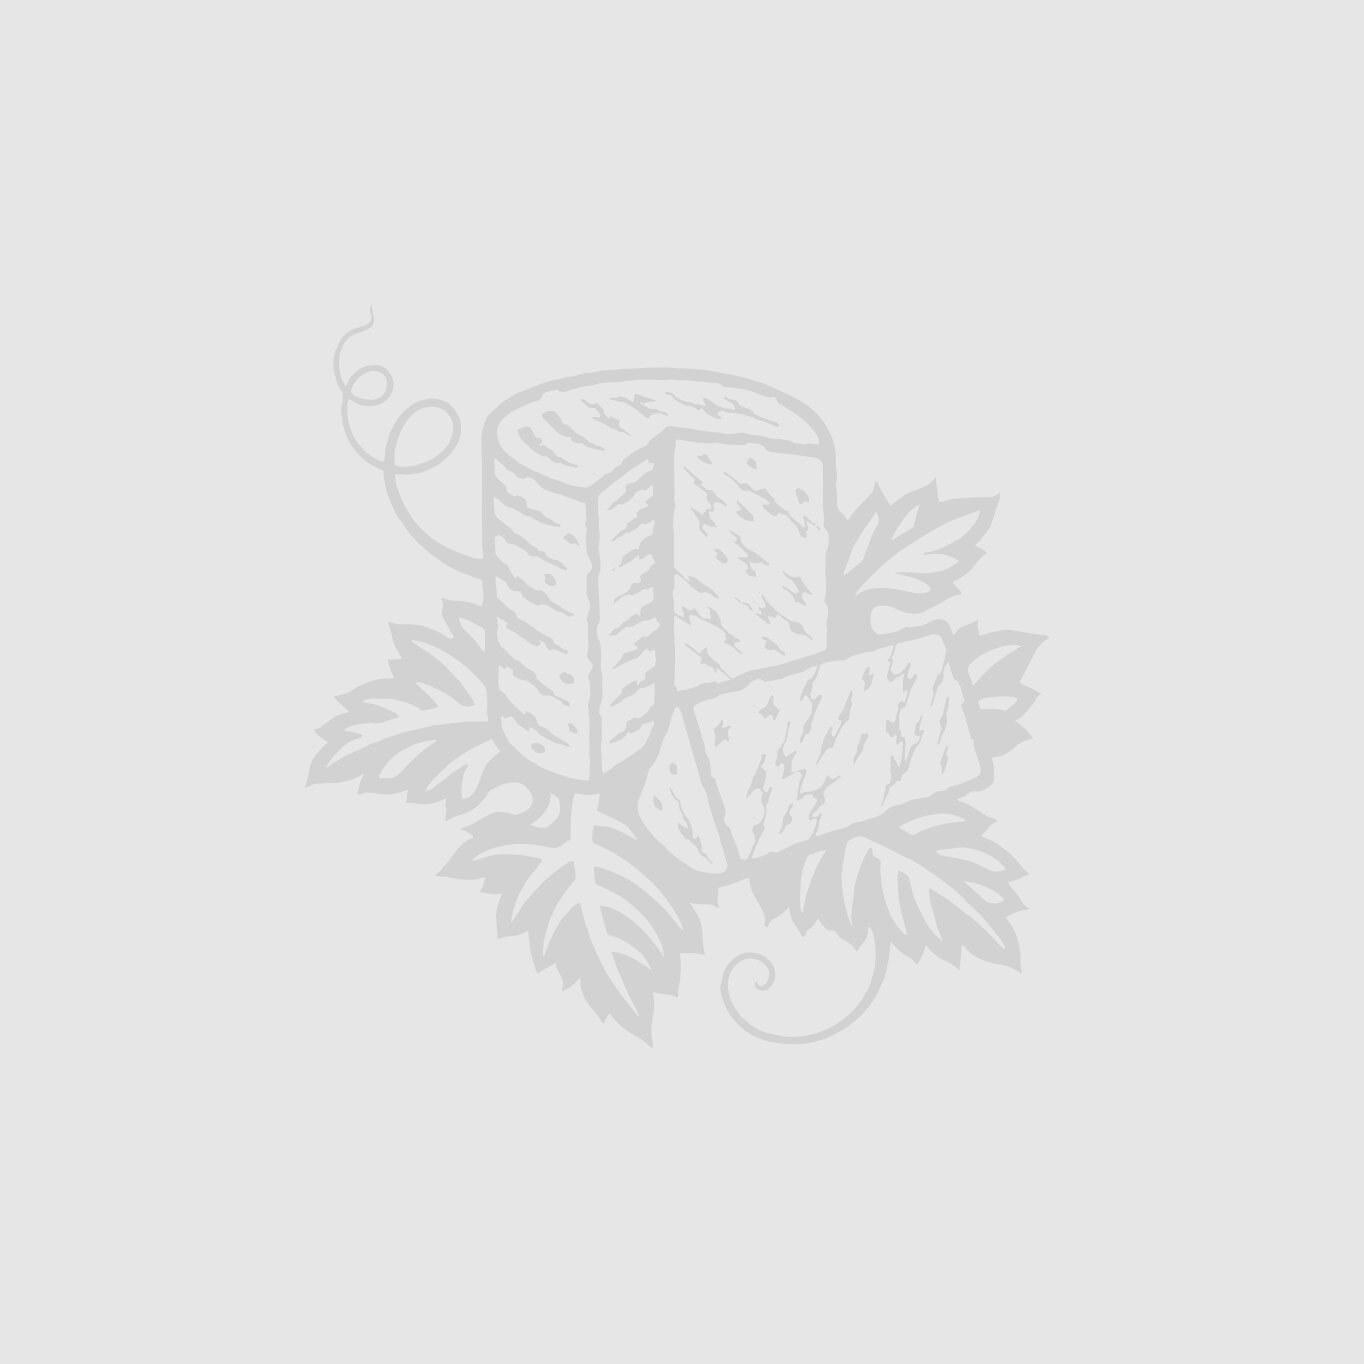 Burren Organic Salmon 90g